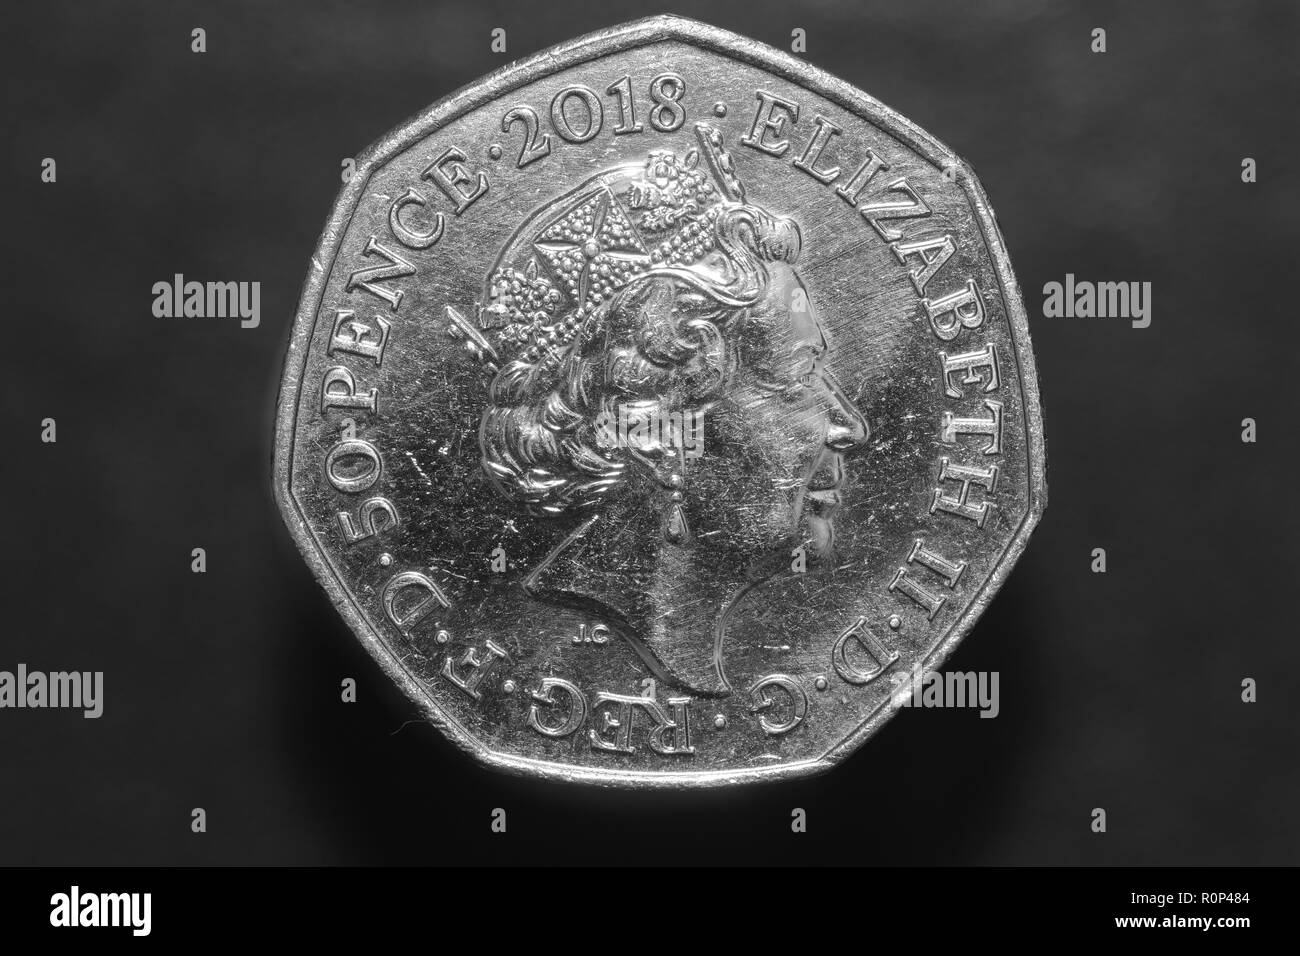 Ein 2018 Royal Mint Paddington Bear 50 Pence Münze Stockfoto Bild